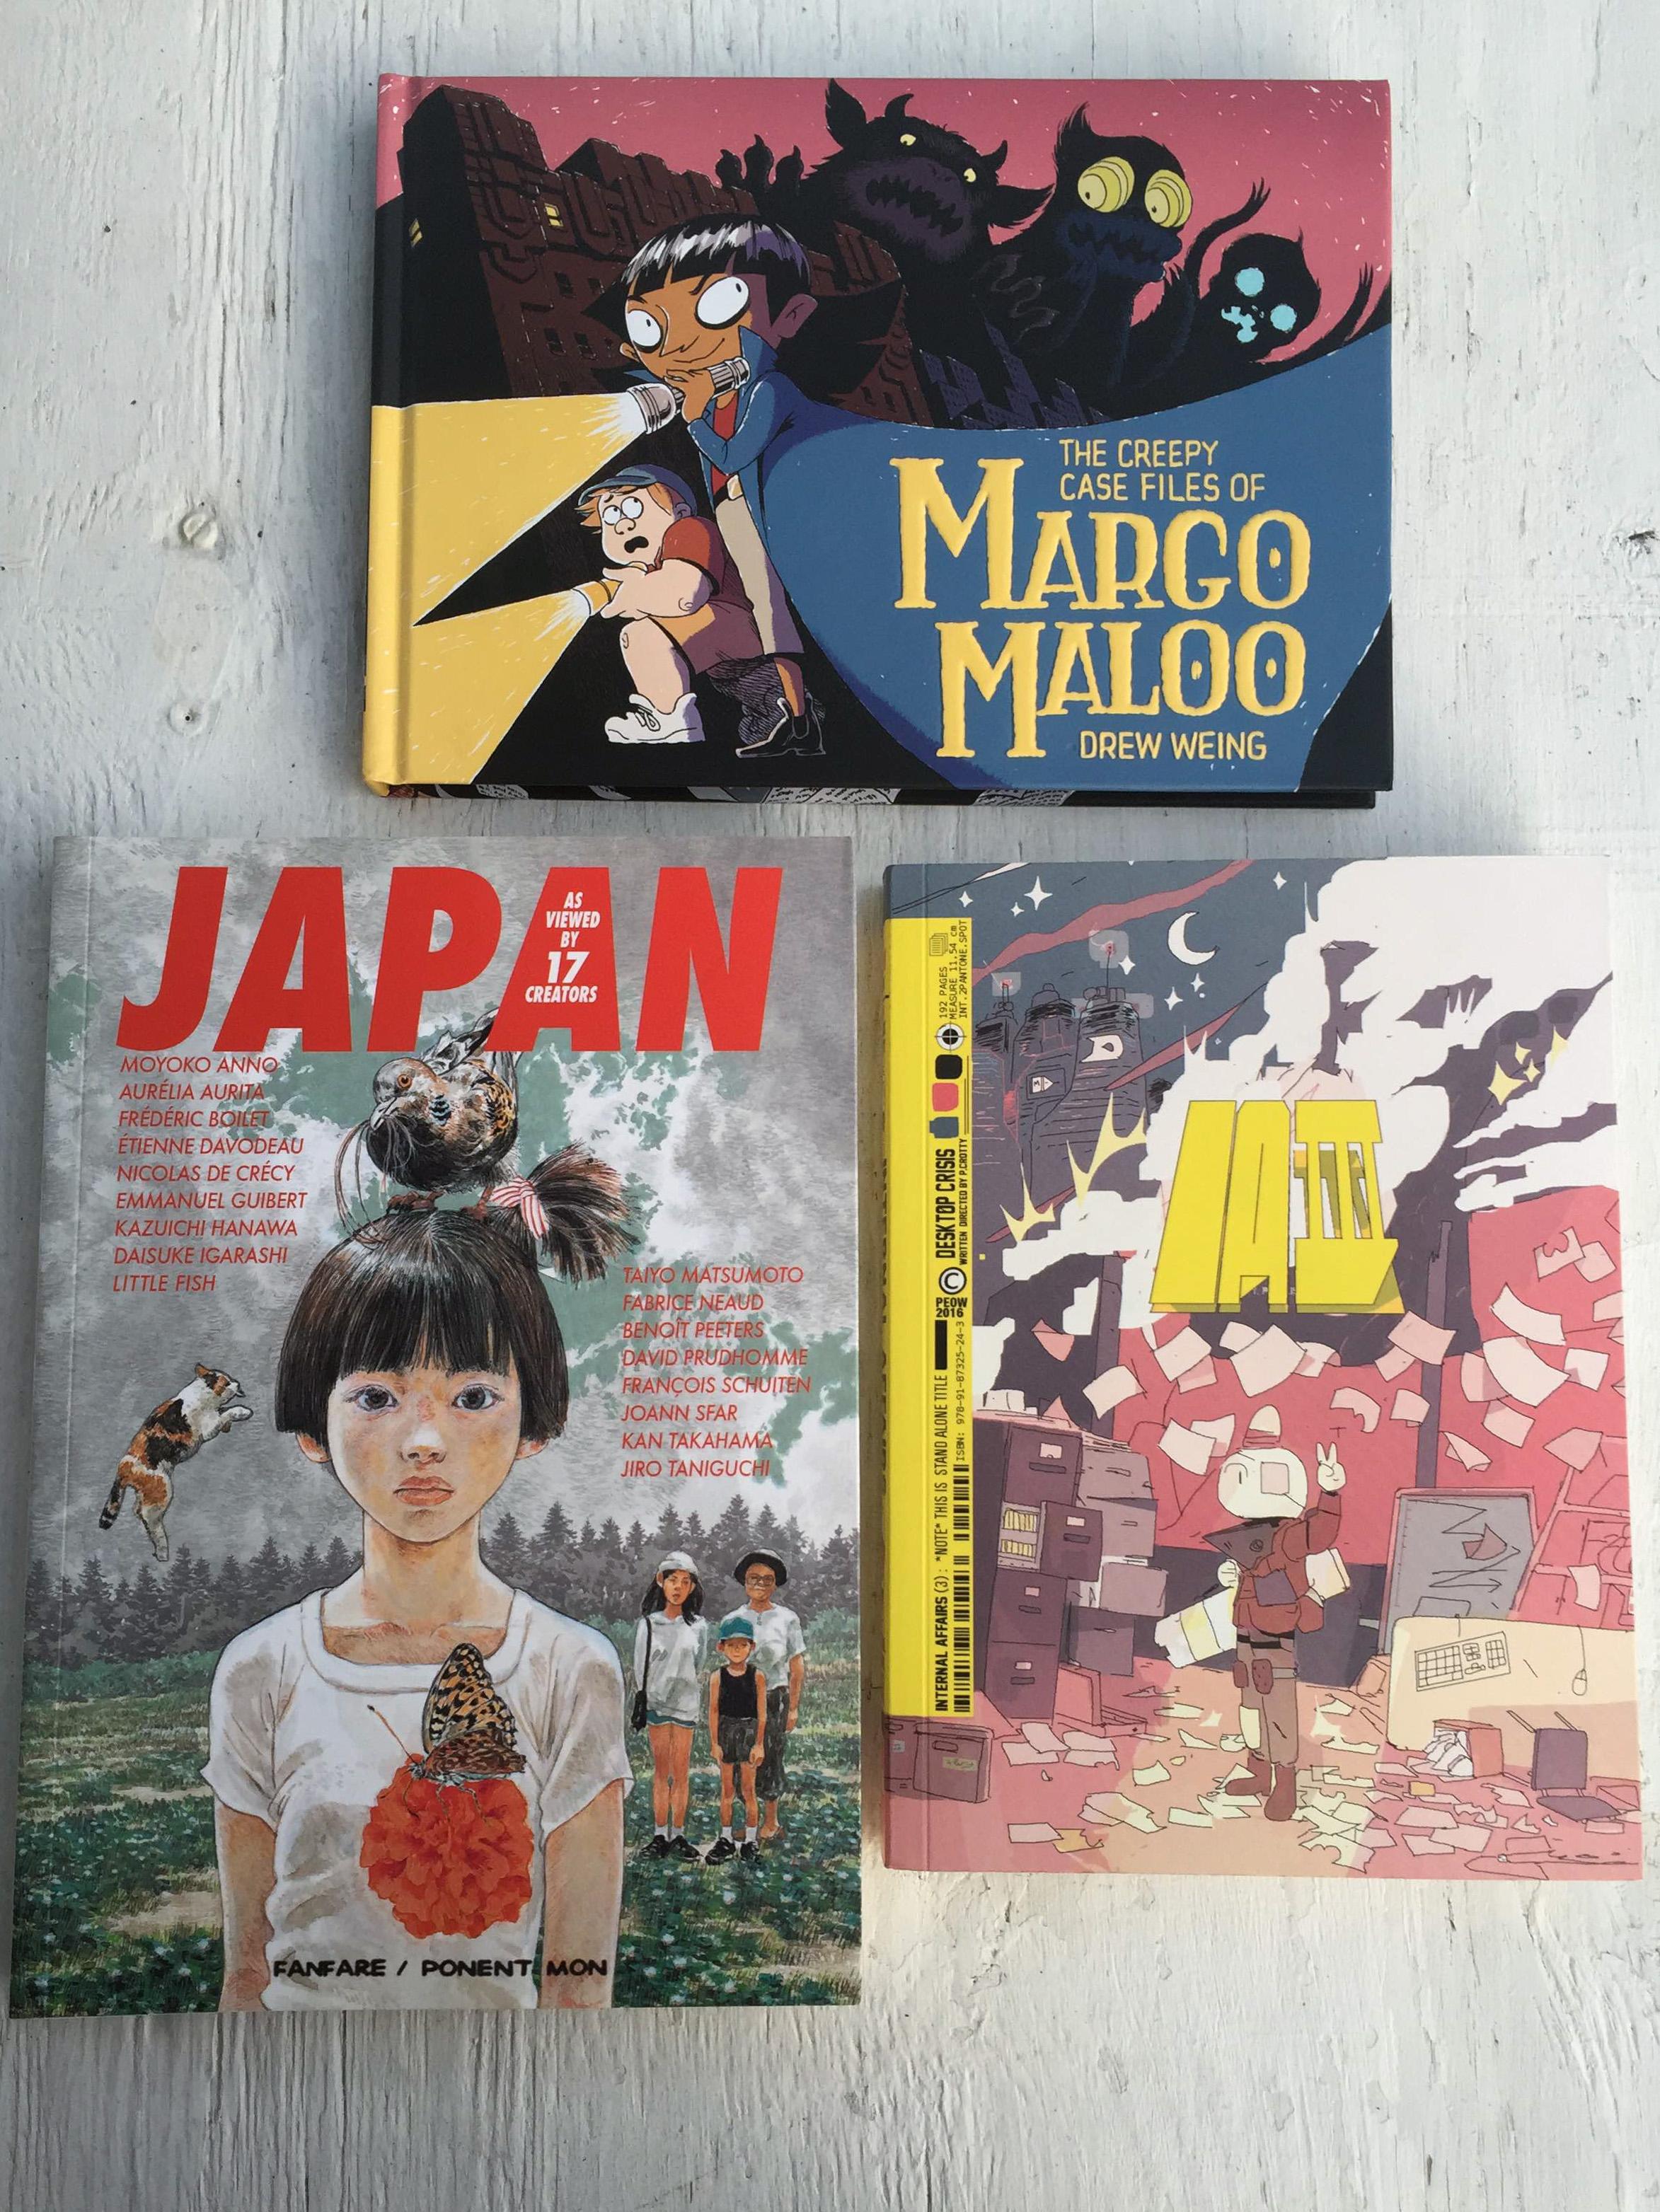 ryan-loot-drew-matsumoto-peow